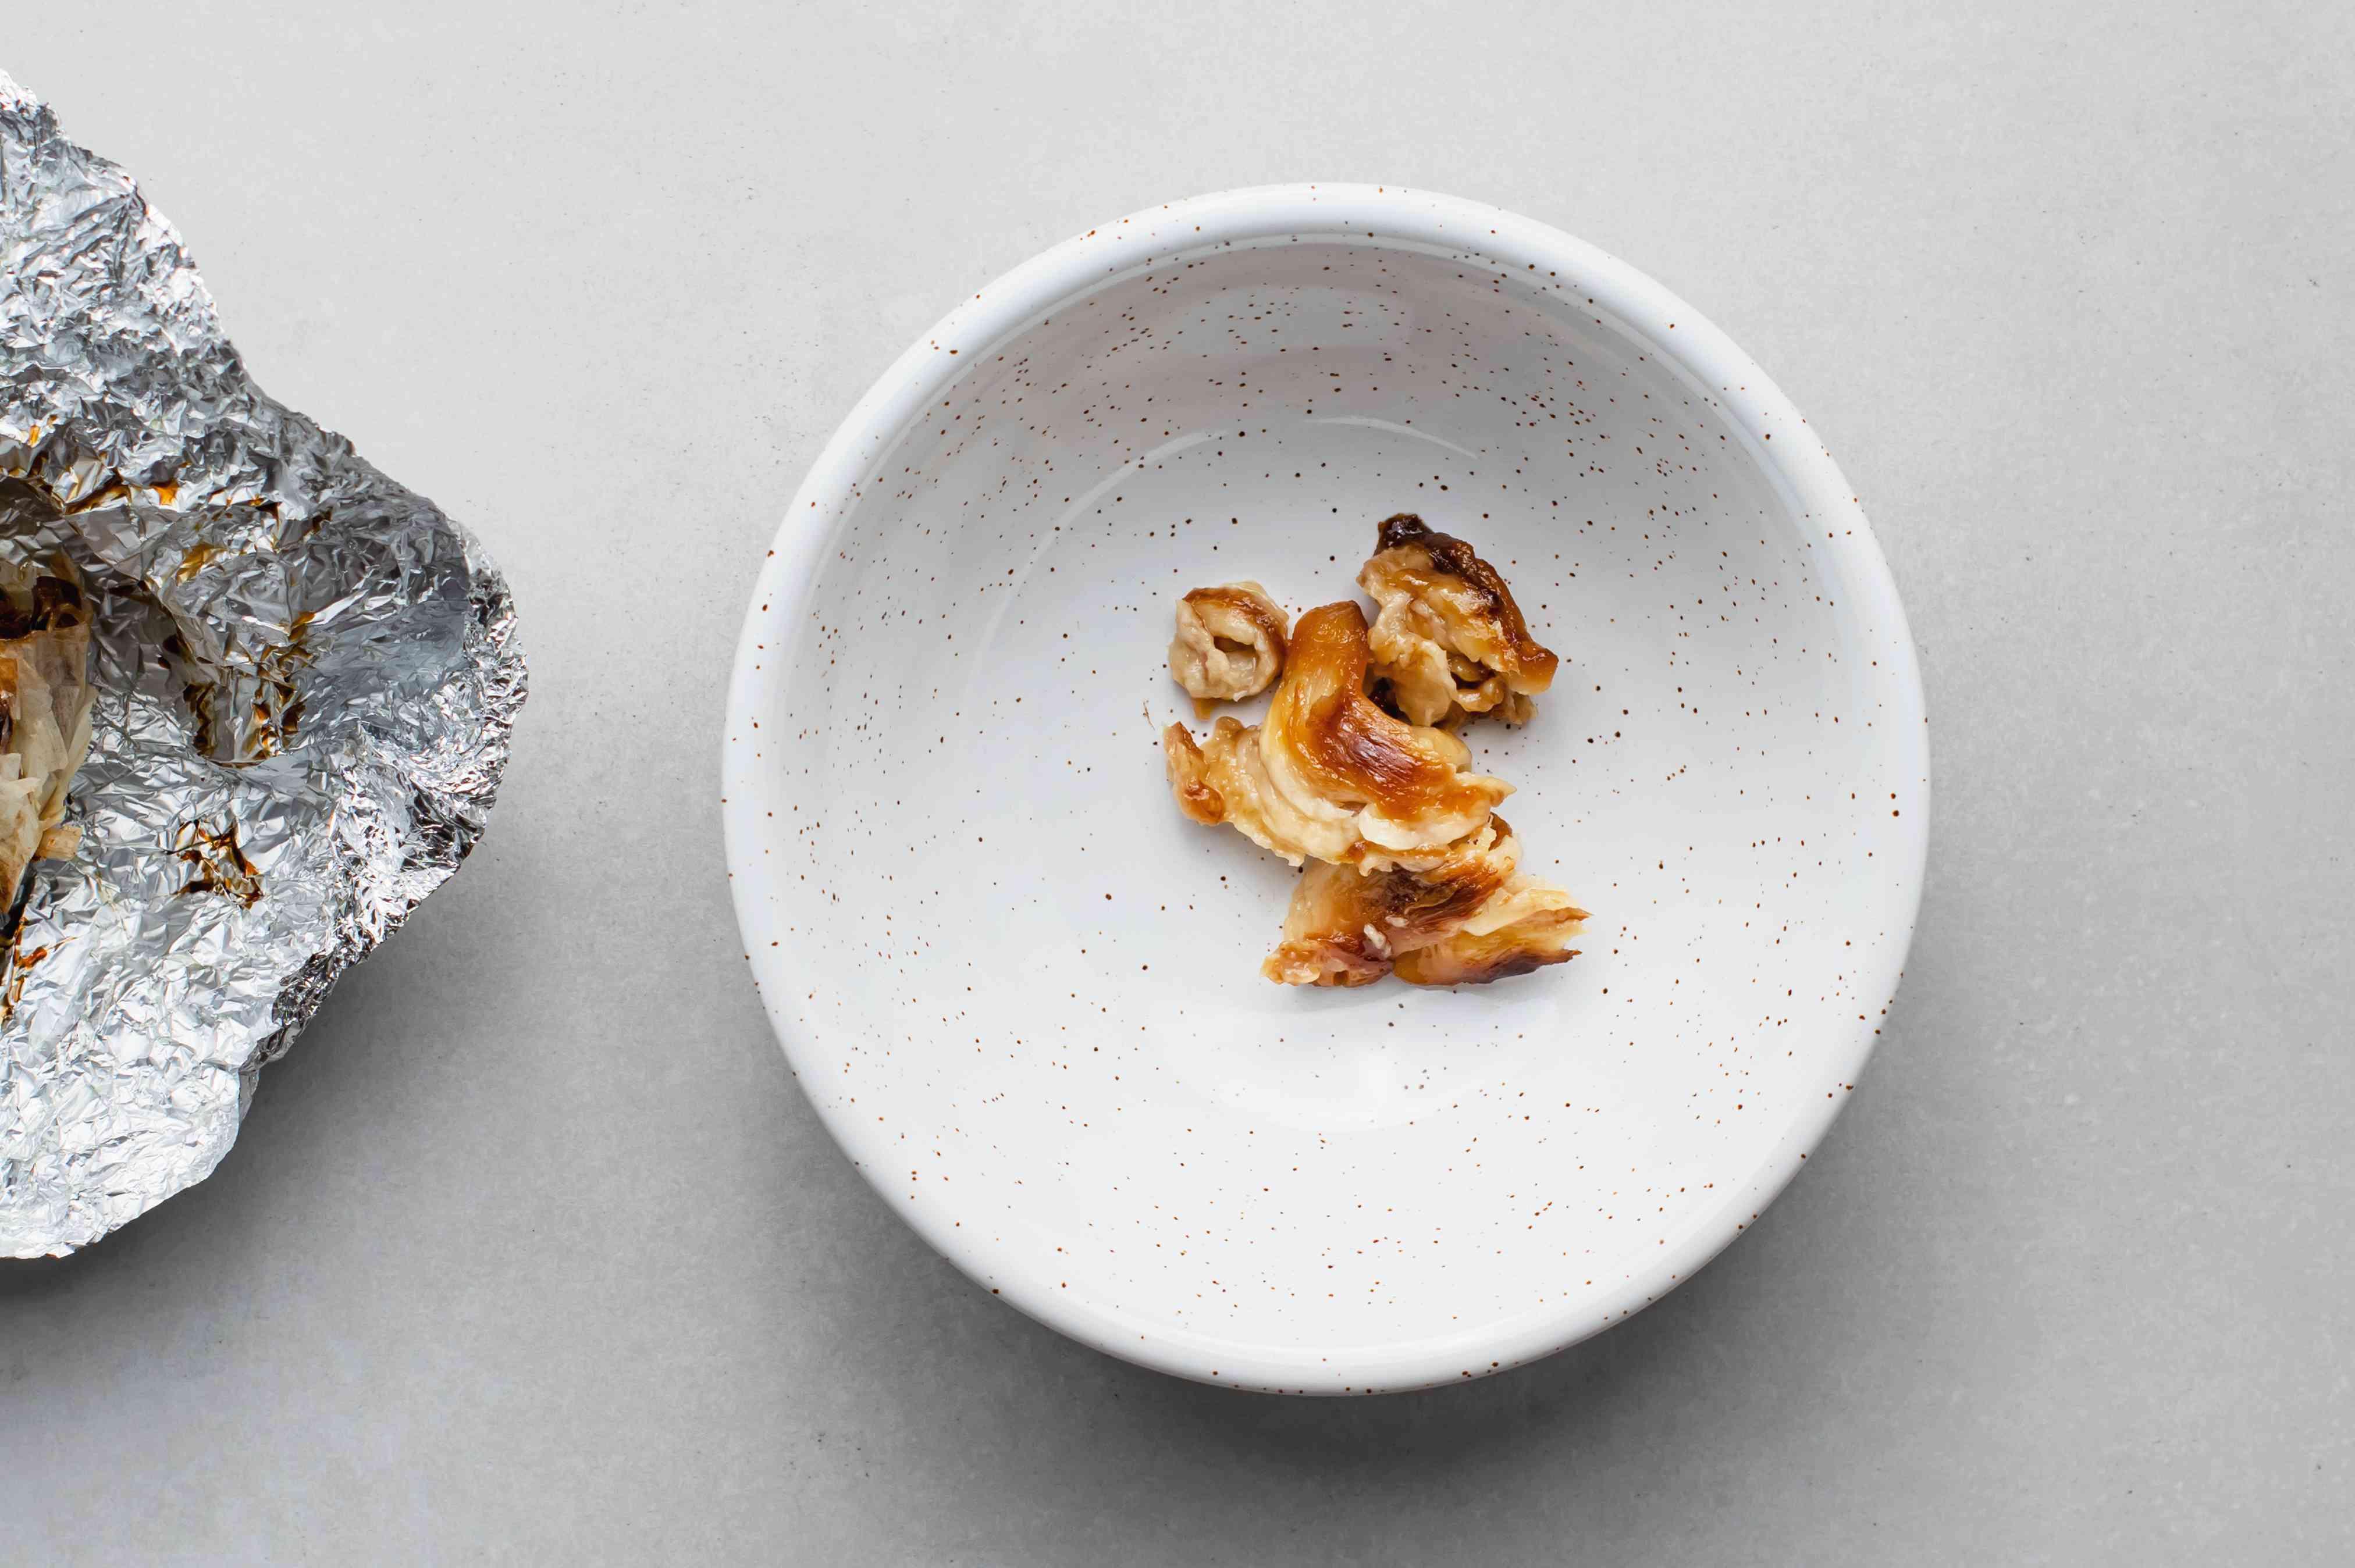 Roasted garlic in a bowl